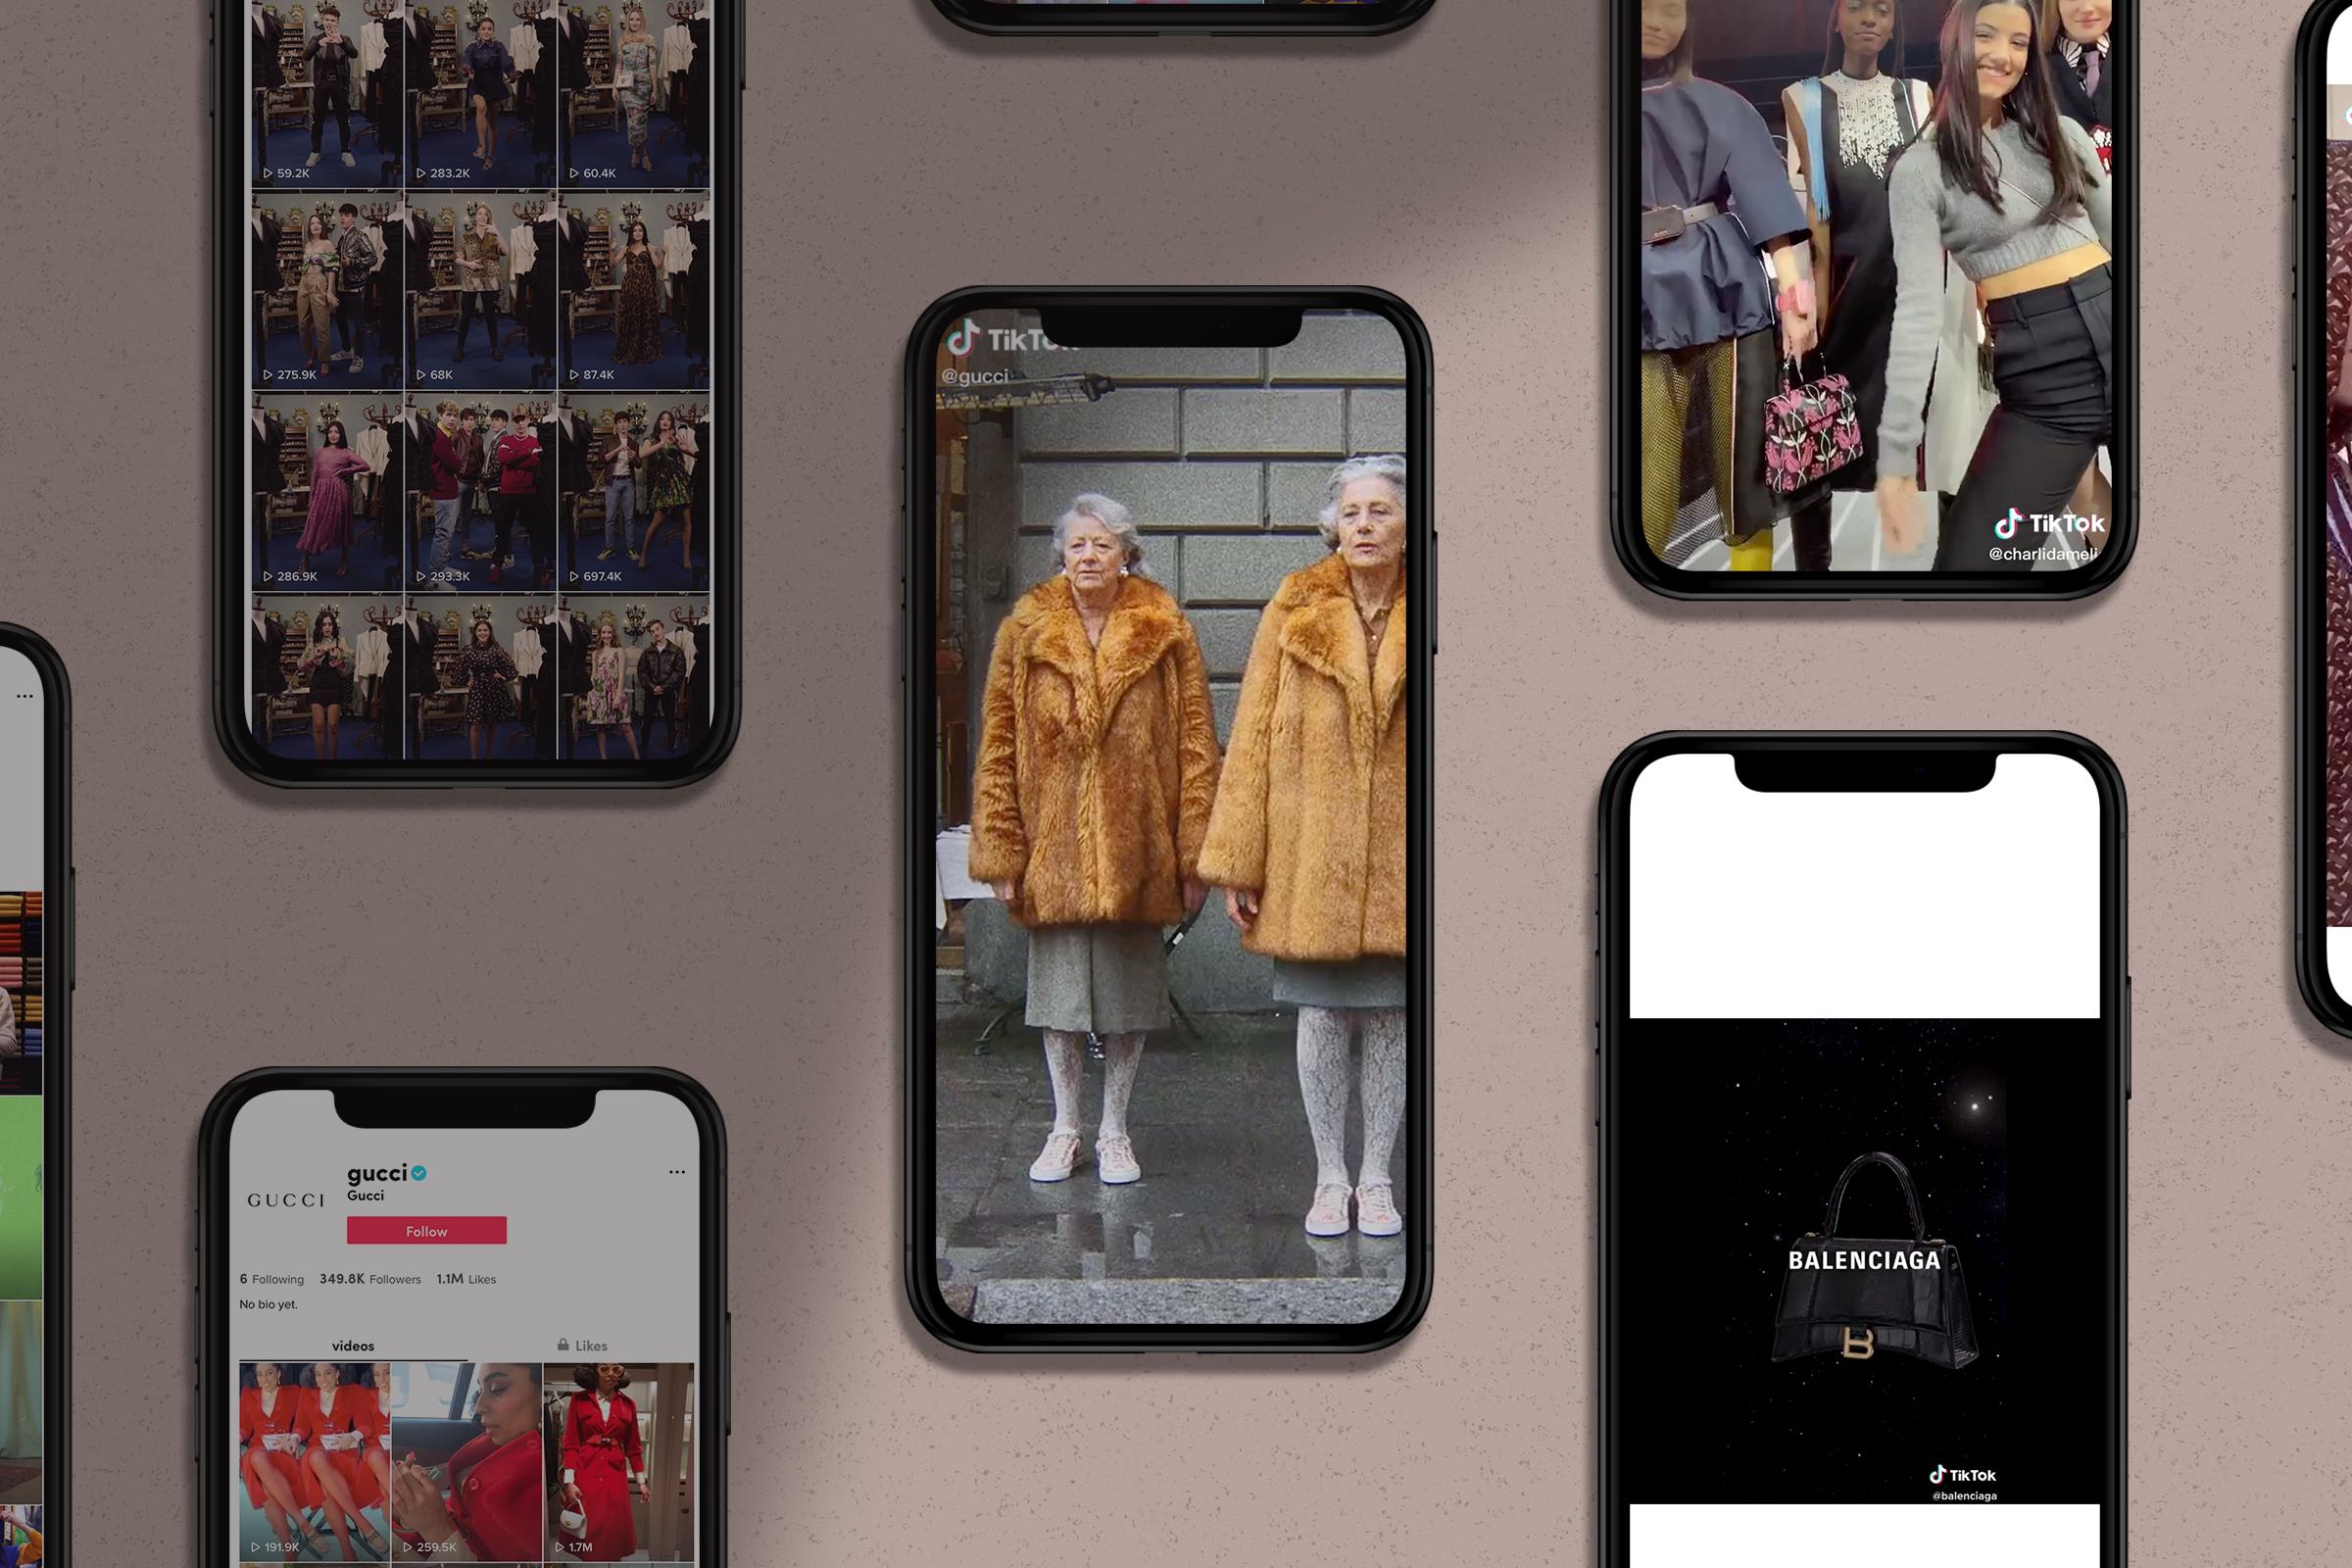 A Fashion Marketer's Guide to TikTok